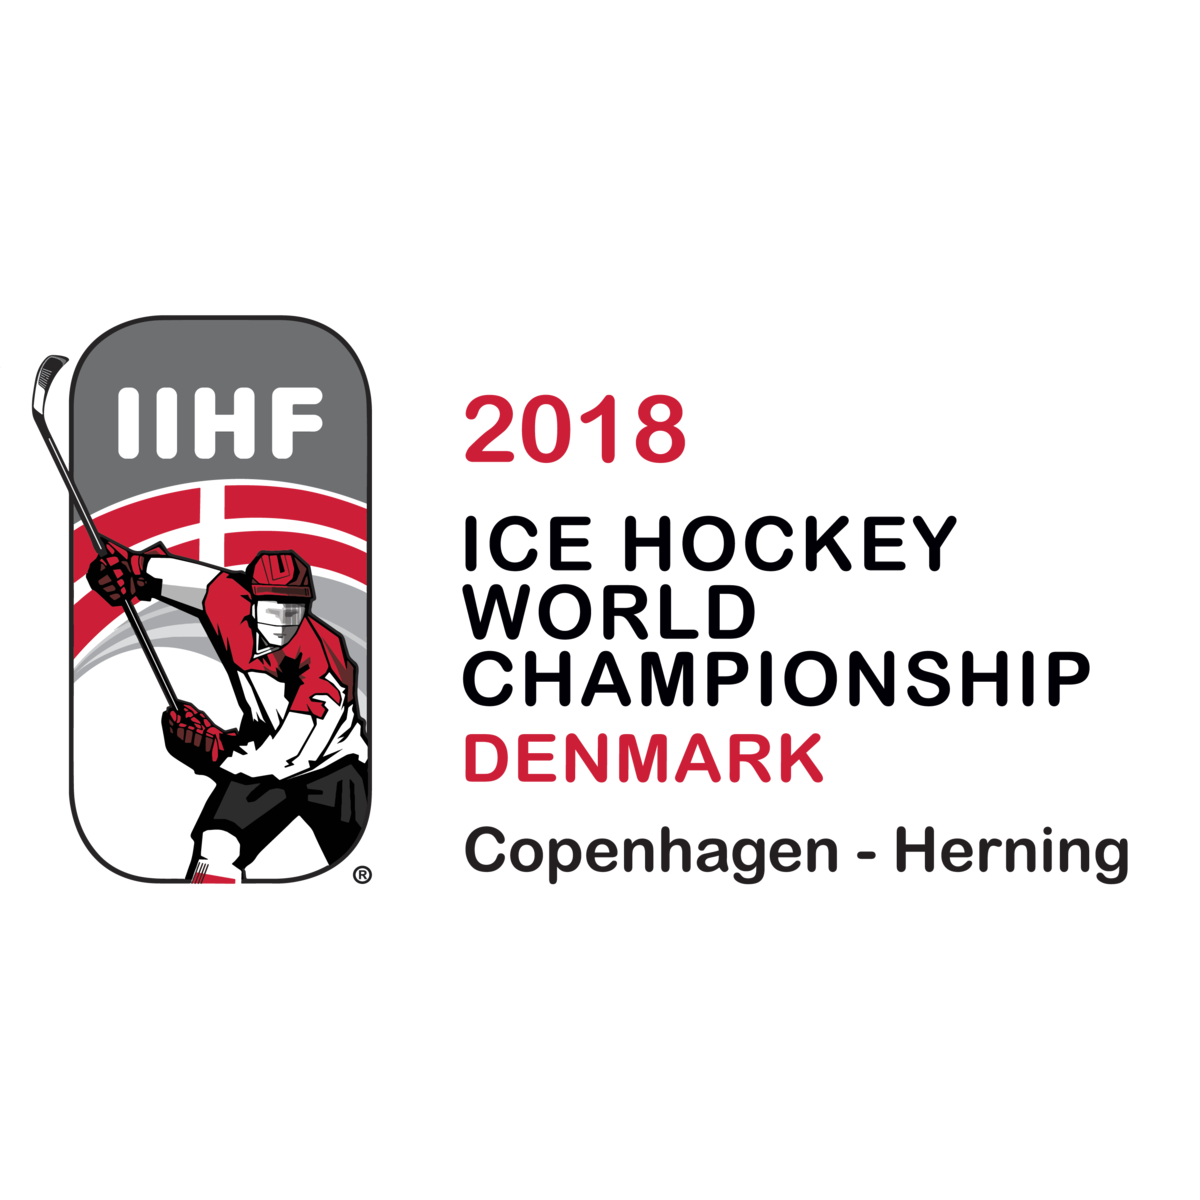 2018 Ice Hockey World Championship